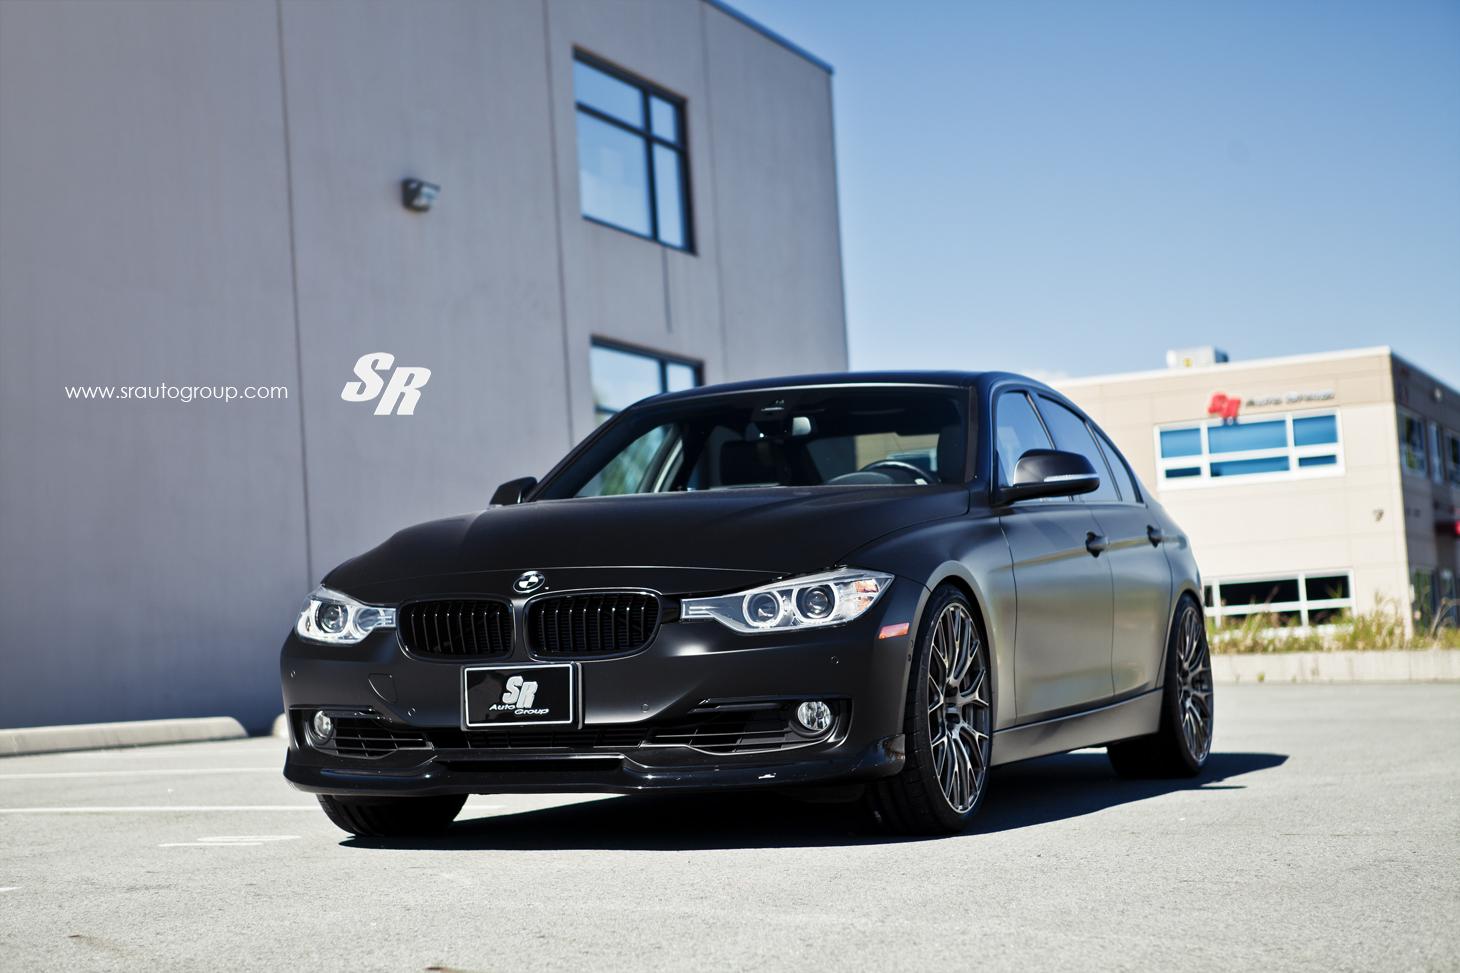 Satin Black BMW F30 3 Series Rides on PUR Wheels ...